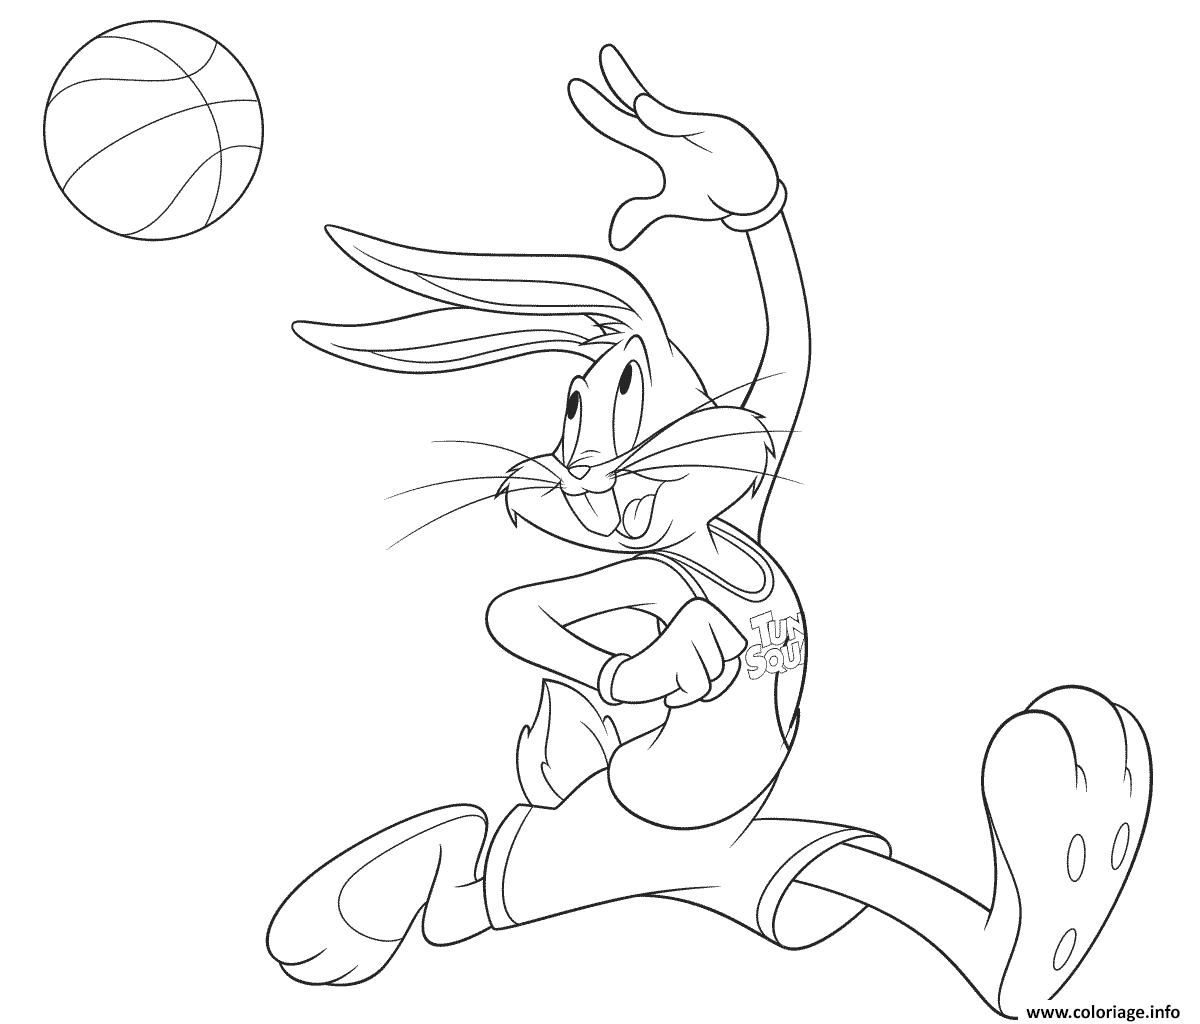 Dessin Bugs Bunny Basketball Coloriage Gratuit à Imprimer